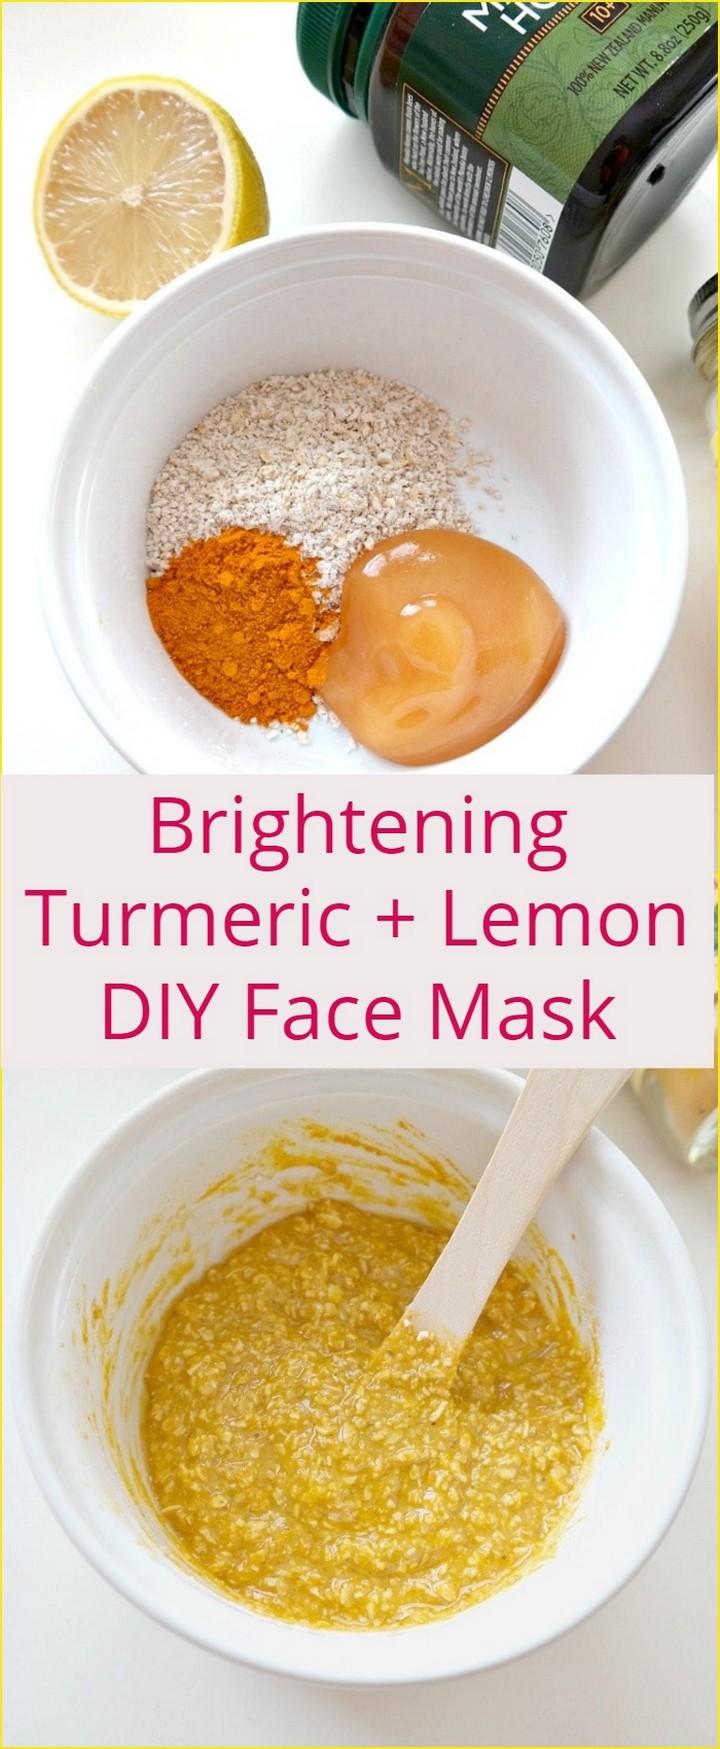 Brightening Turmeric Lemon DIY Face Mask 1